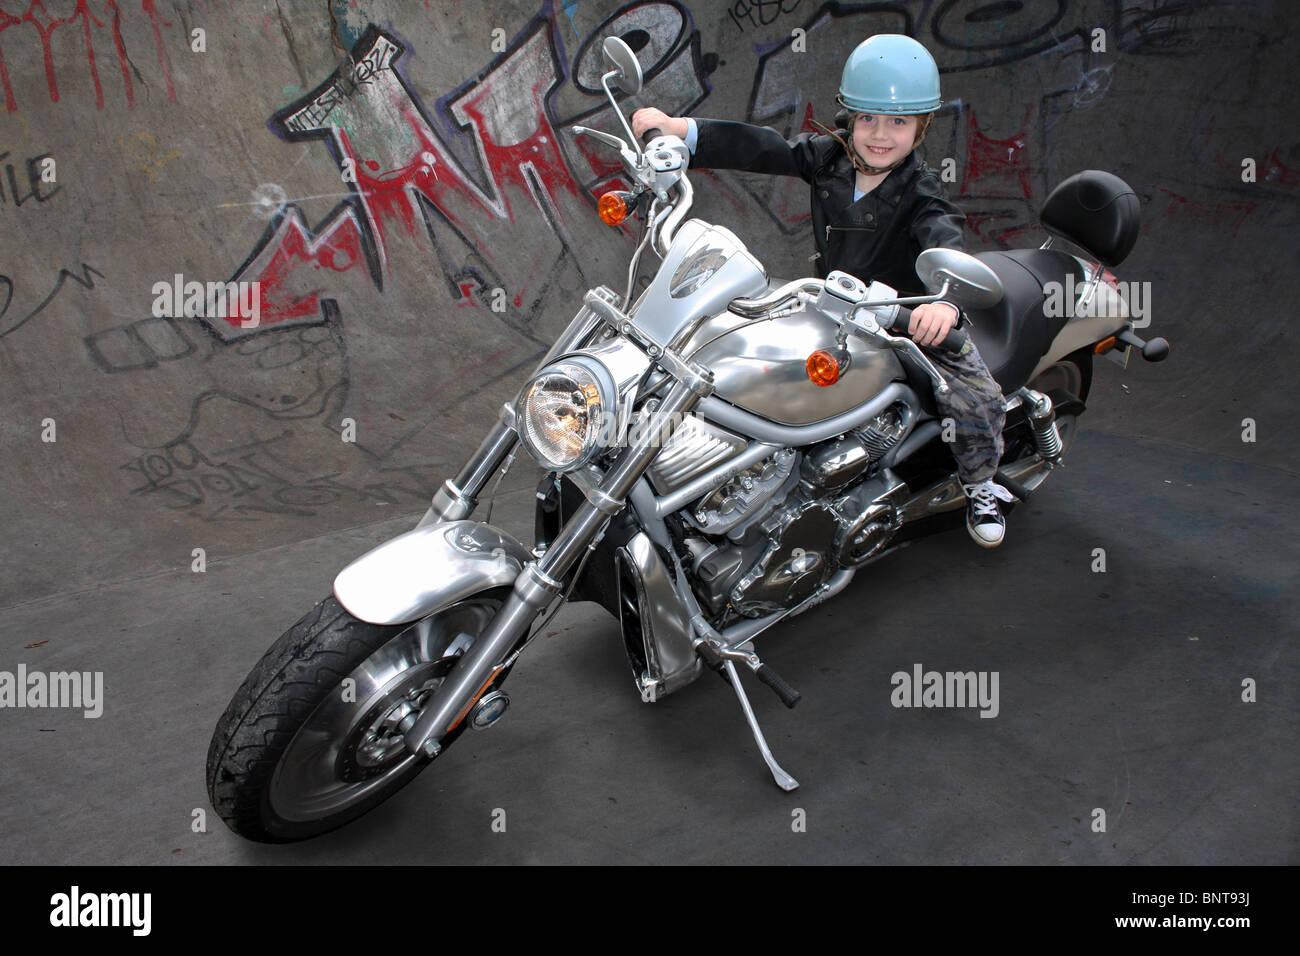 Little Boy On Motorcycle Stock Photos & Little Boy On Motorcycle ...